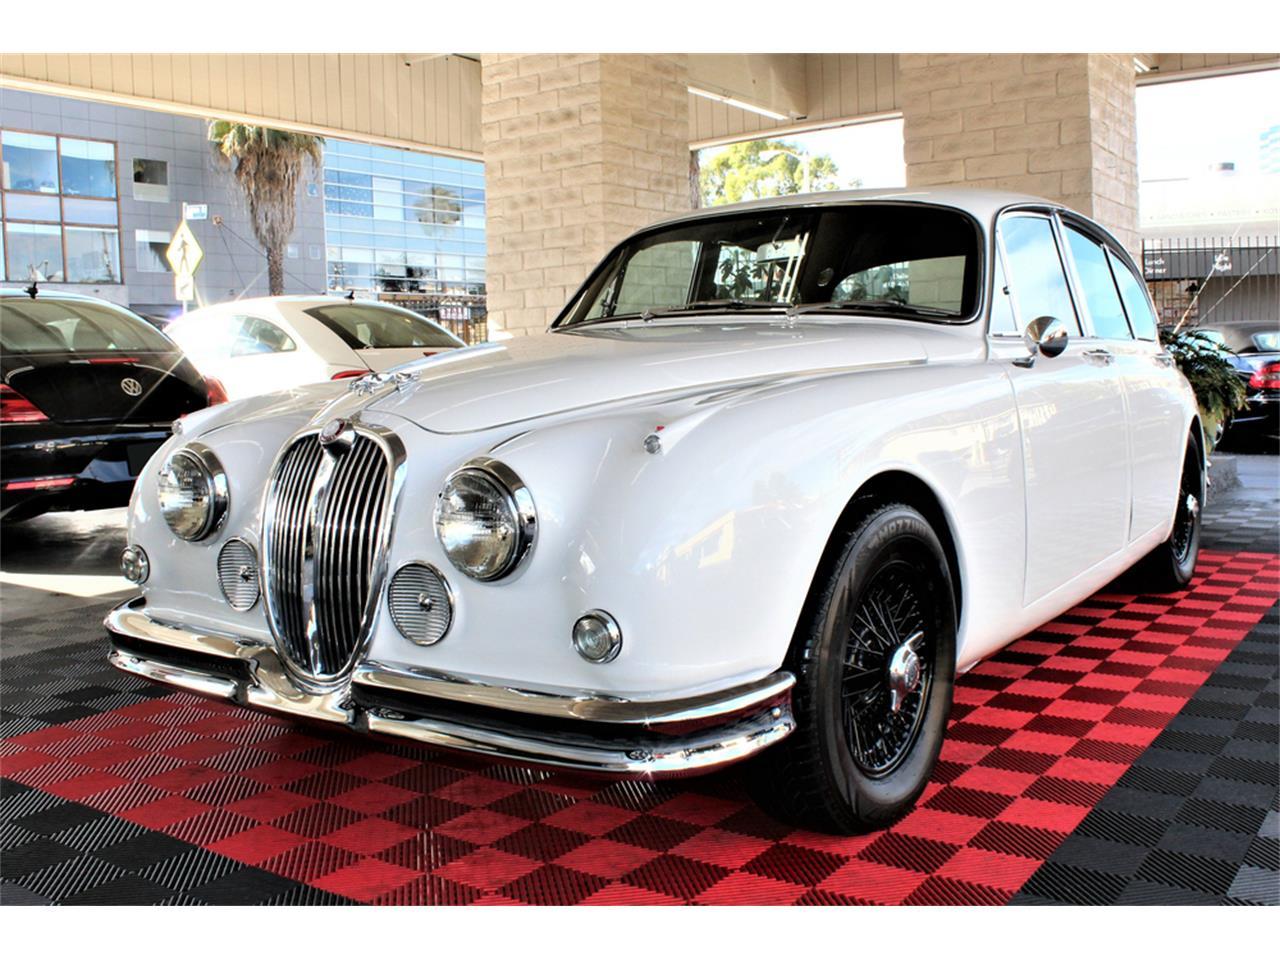 1962 Jaguar Mark II for Sale | ClassicCars.com | CC-1258617